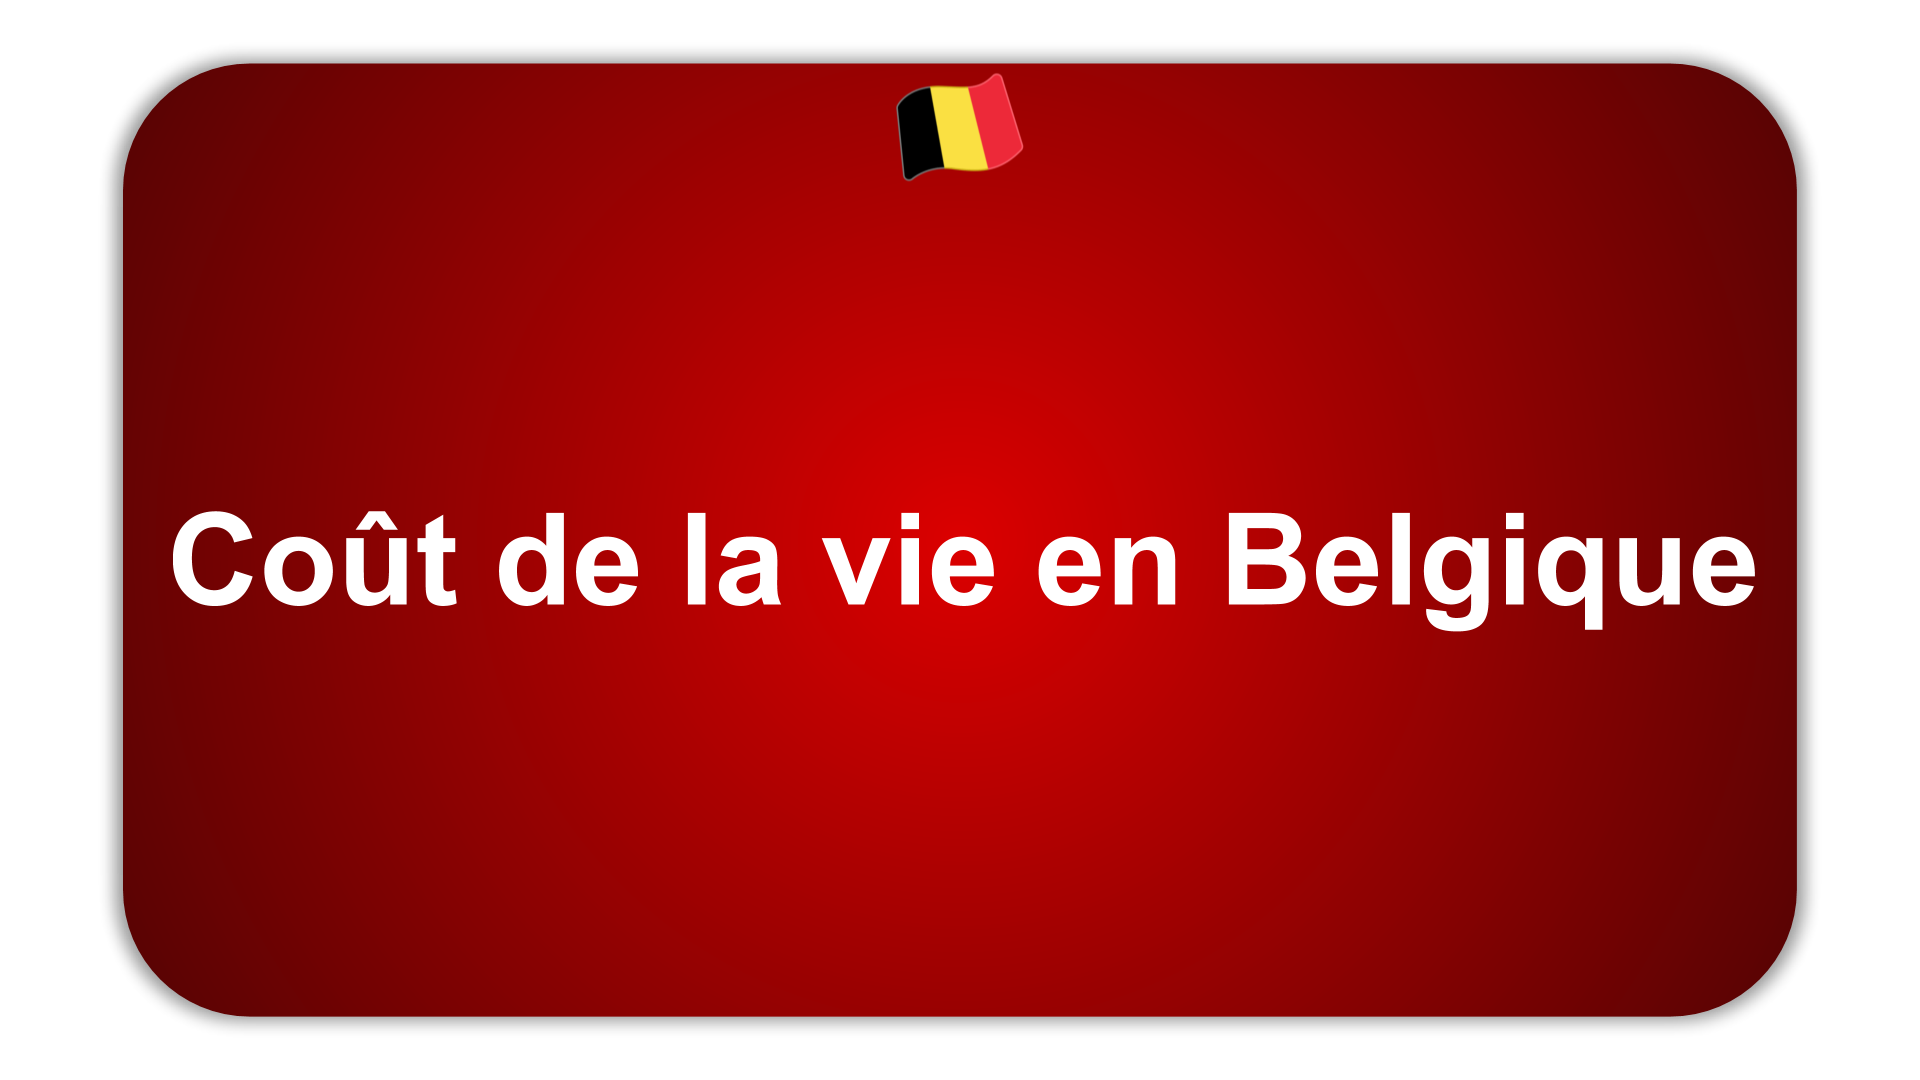 Coût de la vie en Belgique